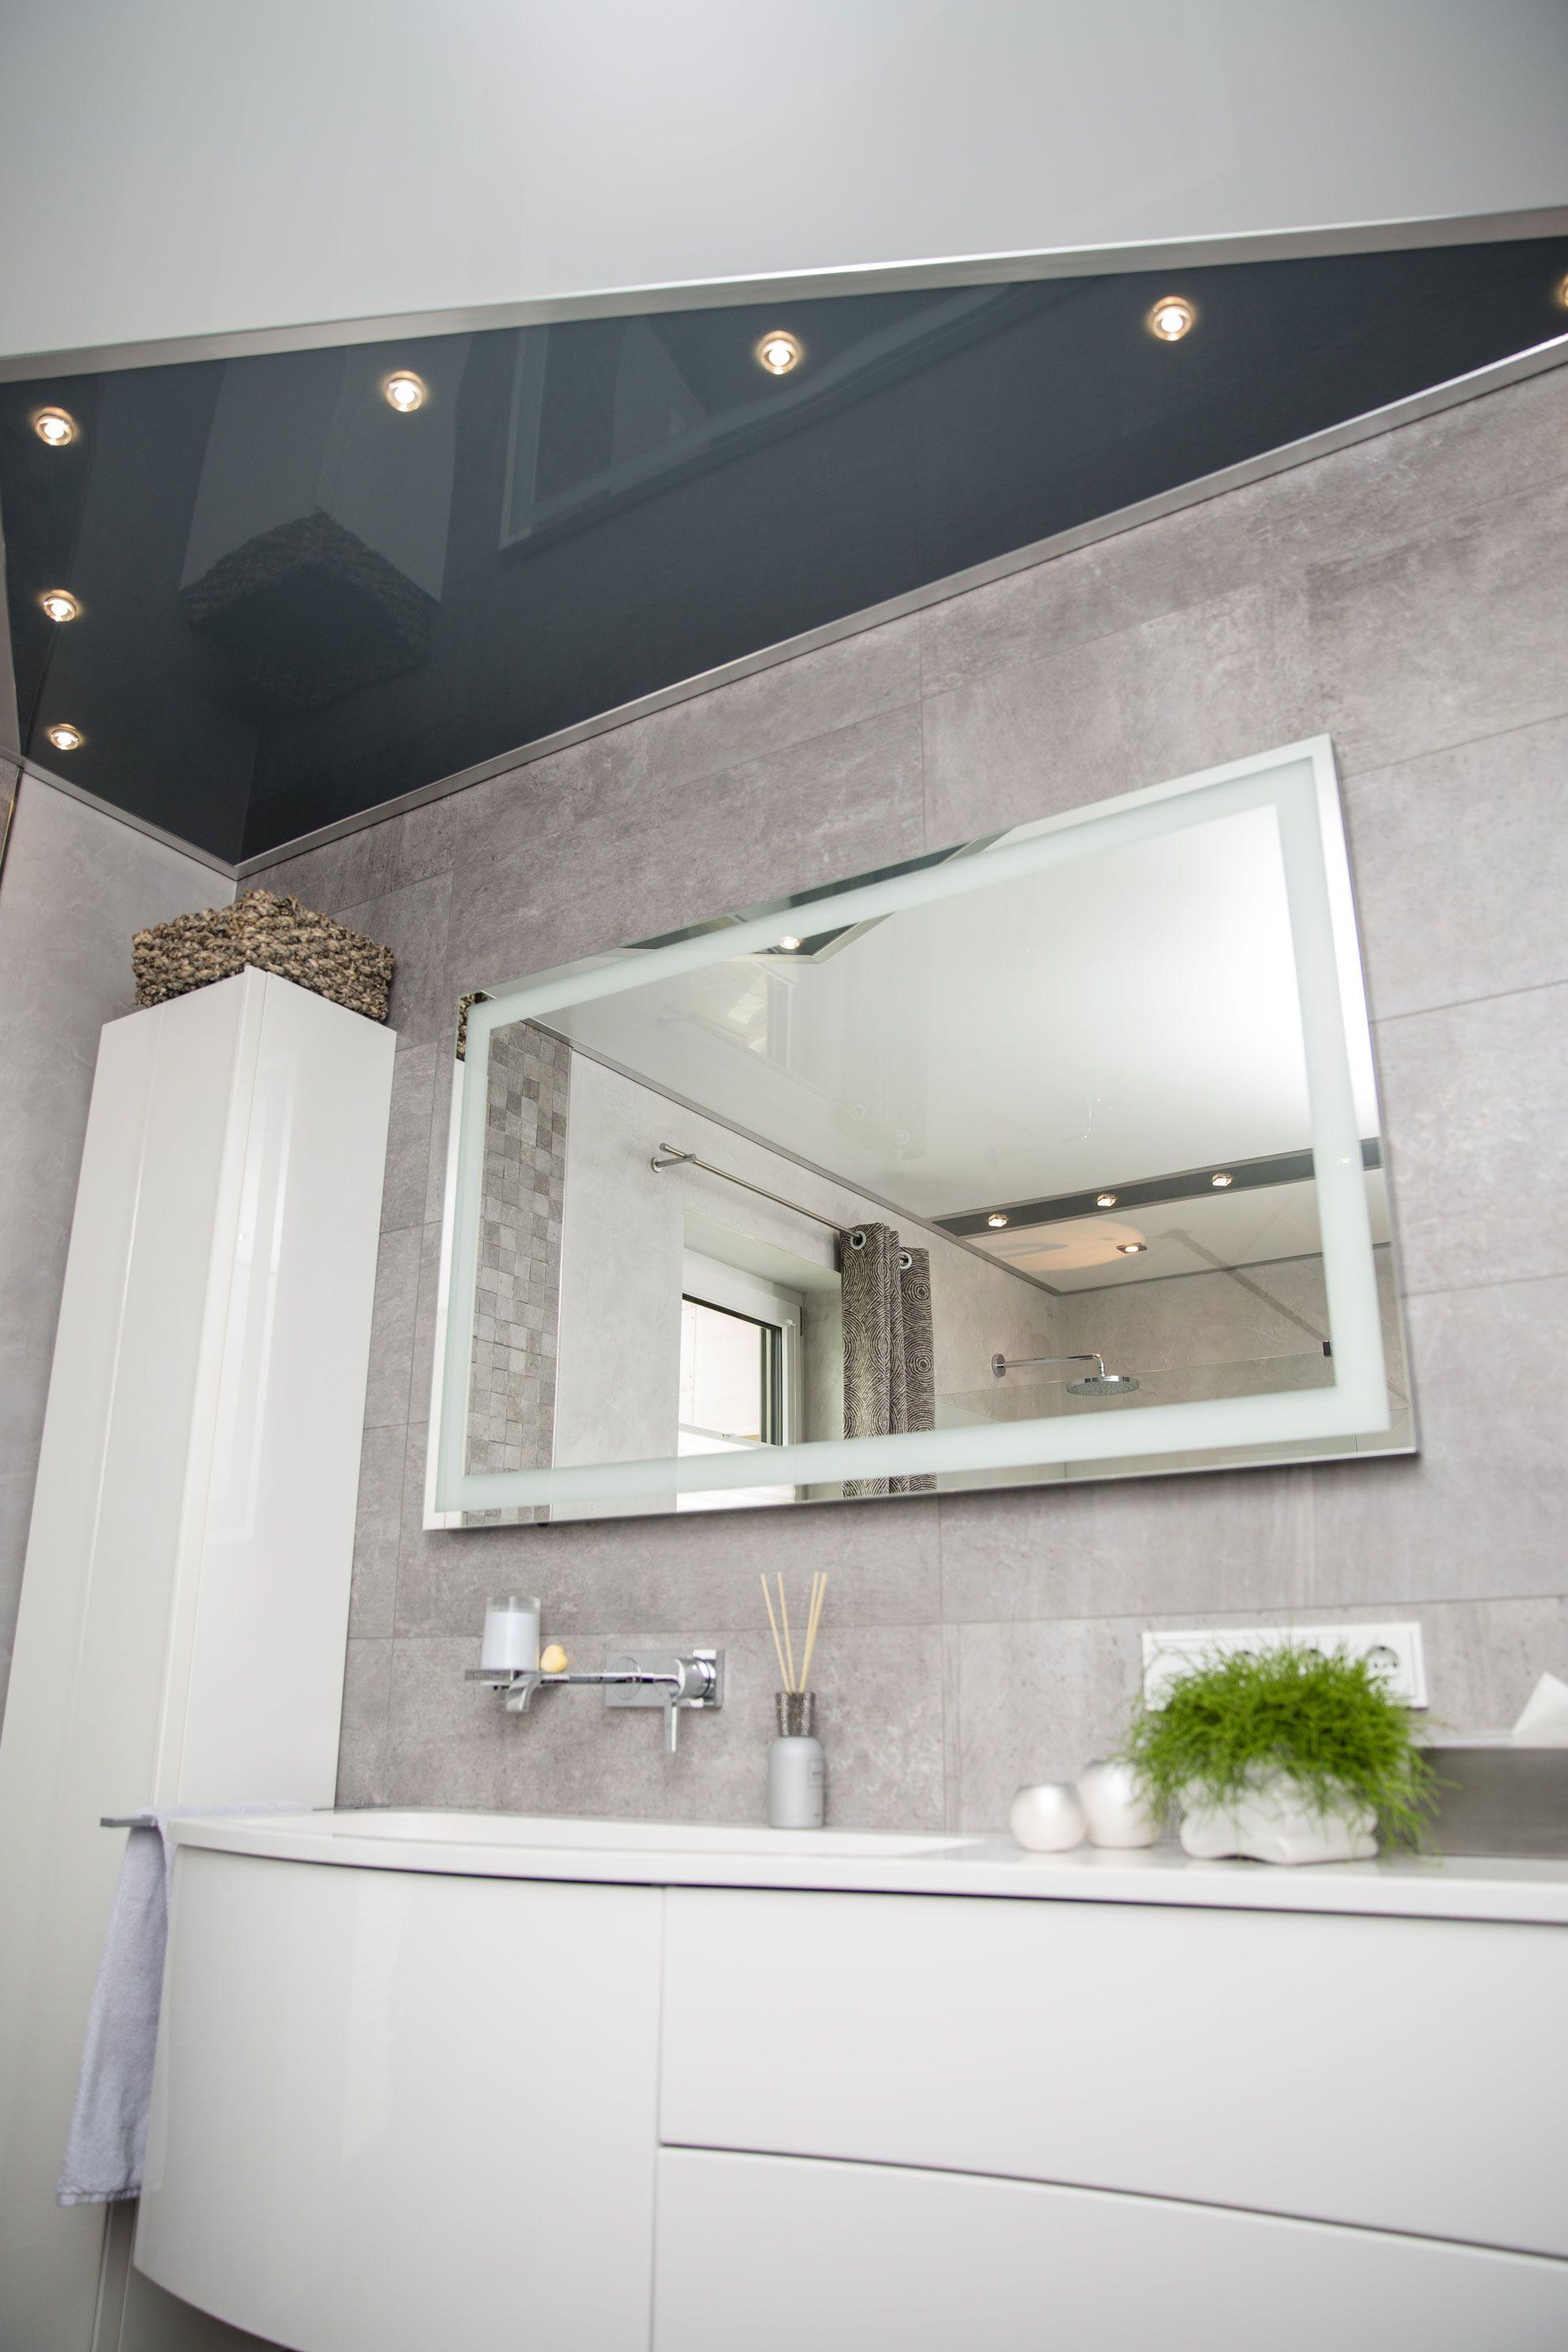 Badezimmer Decke Beleuchtung Badezimmer Decken Badezimmer Badezimmerbeleuchtung